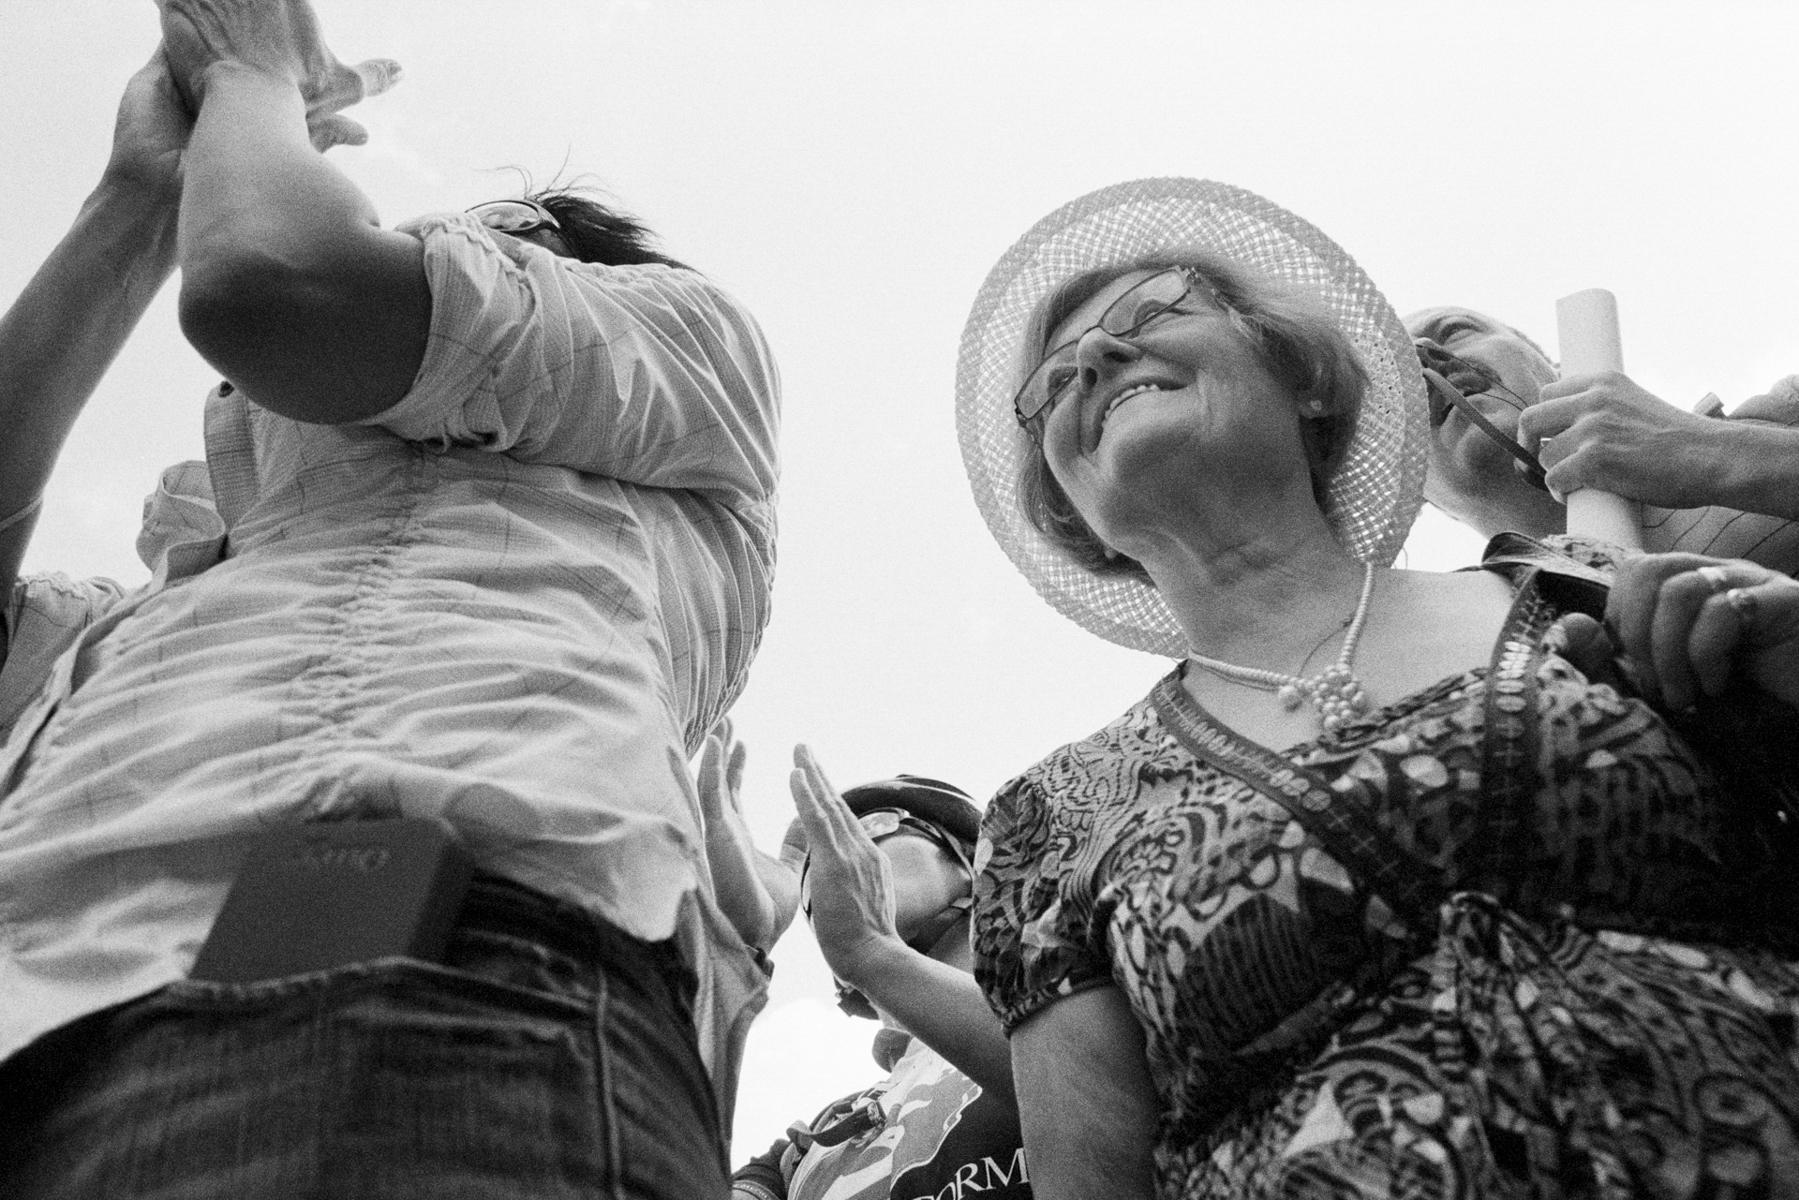 Le Tour de France 2012 Spectators throng to catch gifts that are being distributed by the publicity caravan. Les spectateurs se pressent pour attraper un cadeau qui sera distribué par la voiture. Die Zuschauer drängen sich, um eines der Geschenke zu erhaschen, die von den Wagen verteilt werden. Los espectadores se aglomeran para coger un regalito que es distribuido por la carroza.